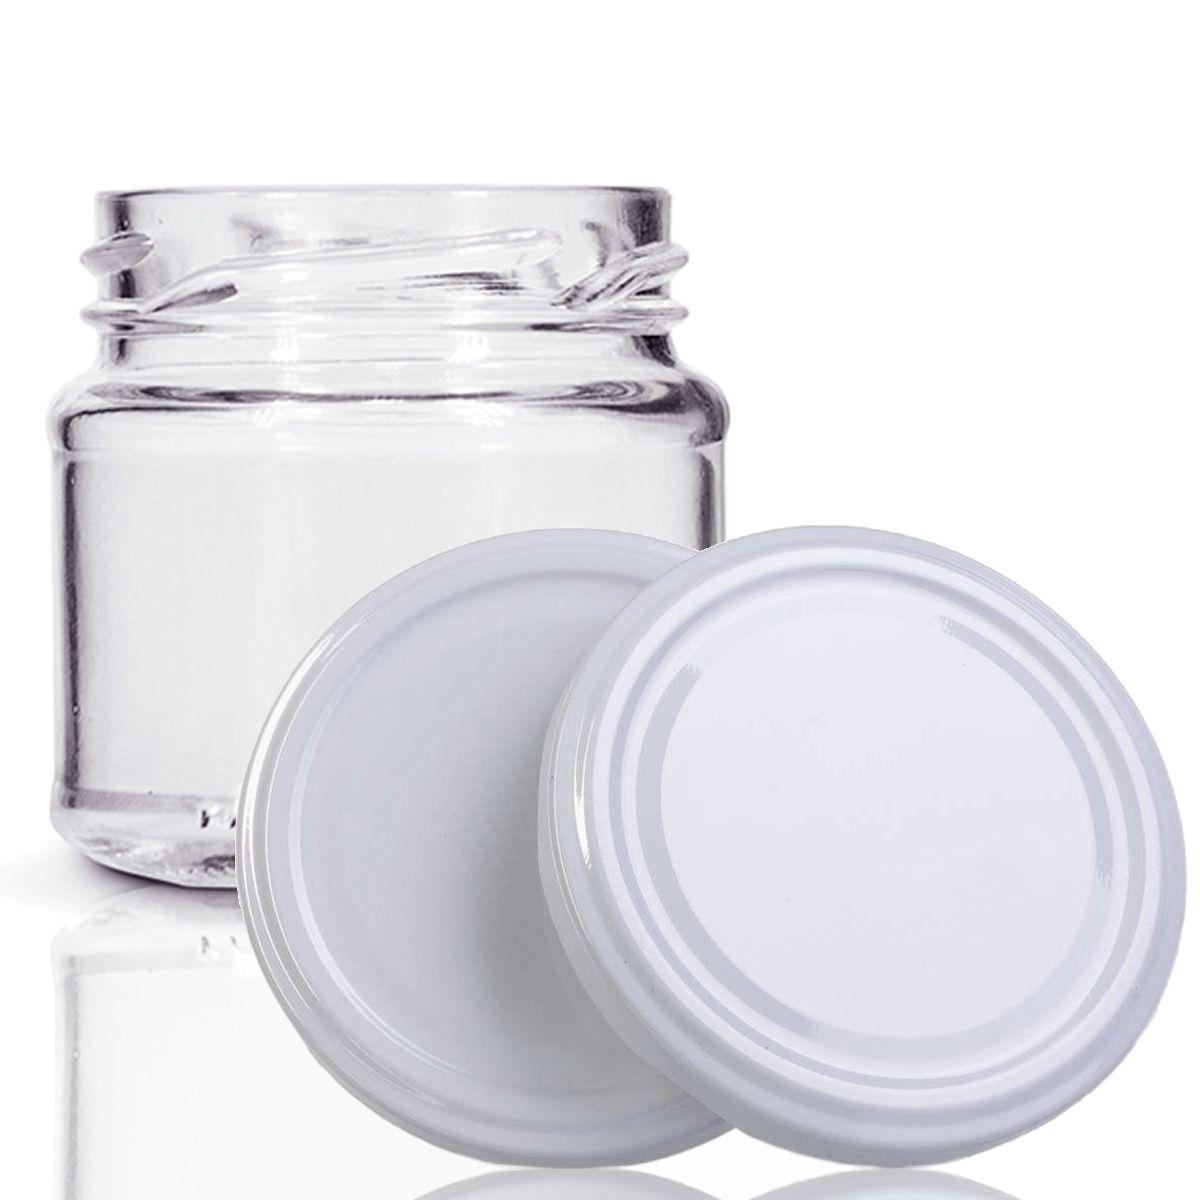 12 Potes De Vidro Mini Belém 150 Ml Tampa Branca + Lacre  - EMPÓRIO PACK